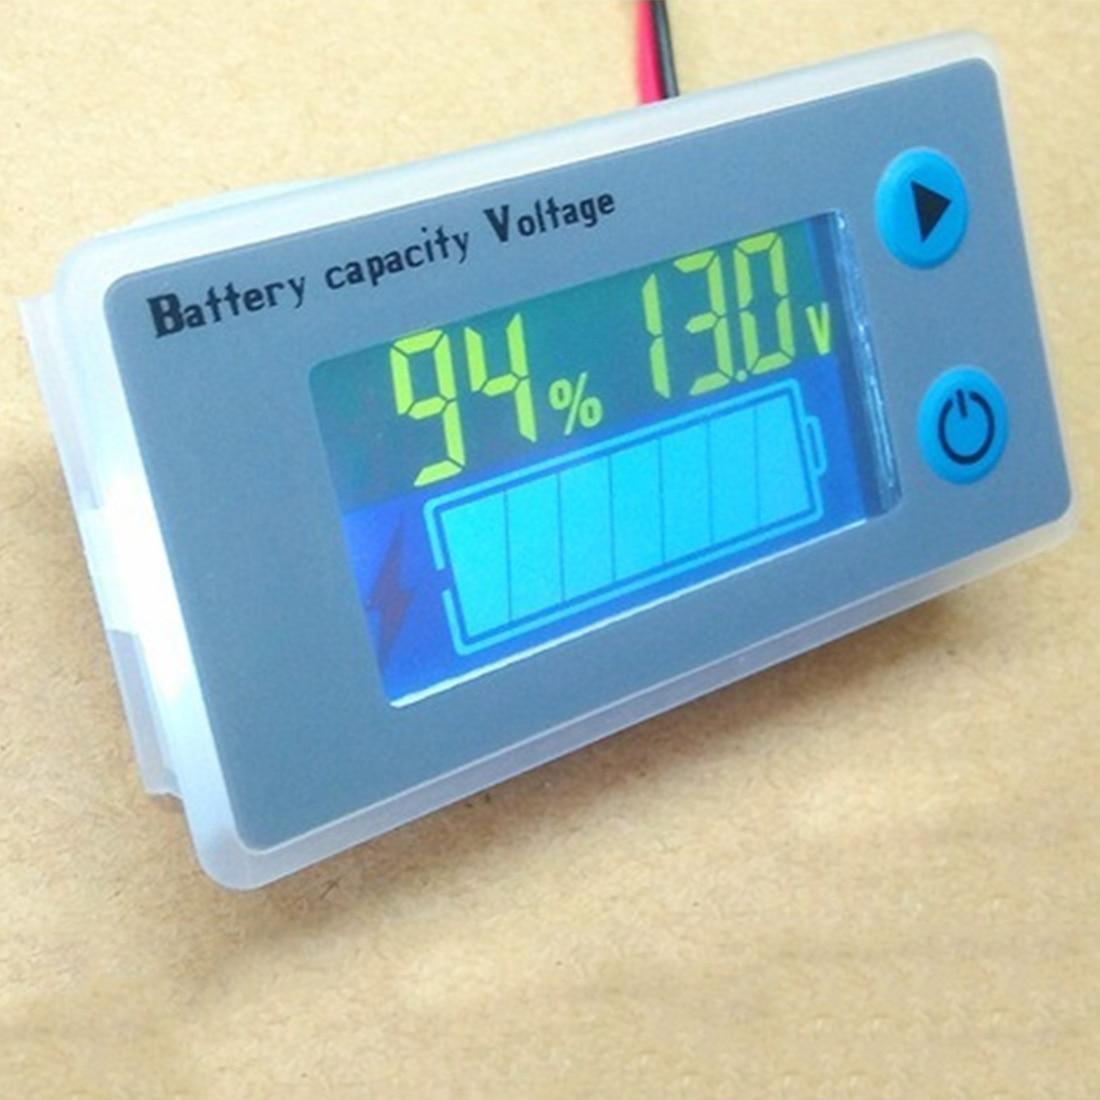 10-100V LCD Household Battery Test Voltmeter JS-C33 Car Acid Lead Lithium Battery Capacity Indicator Universal Digital Voltage